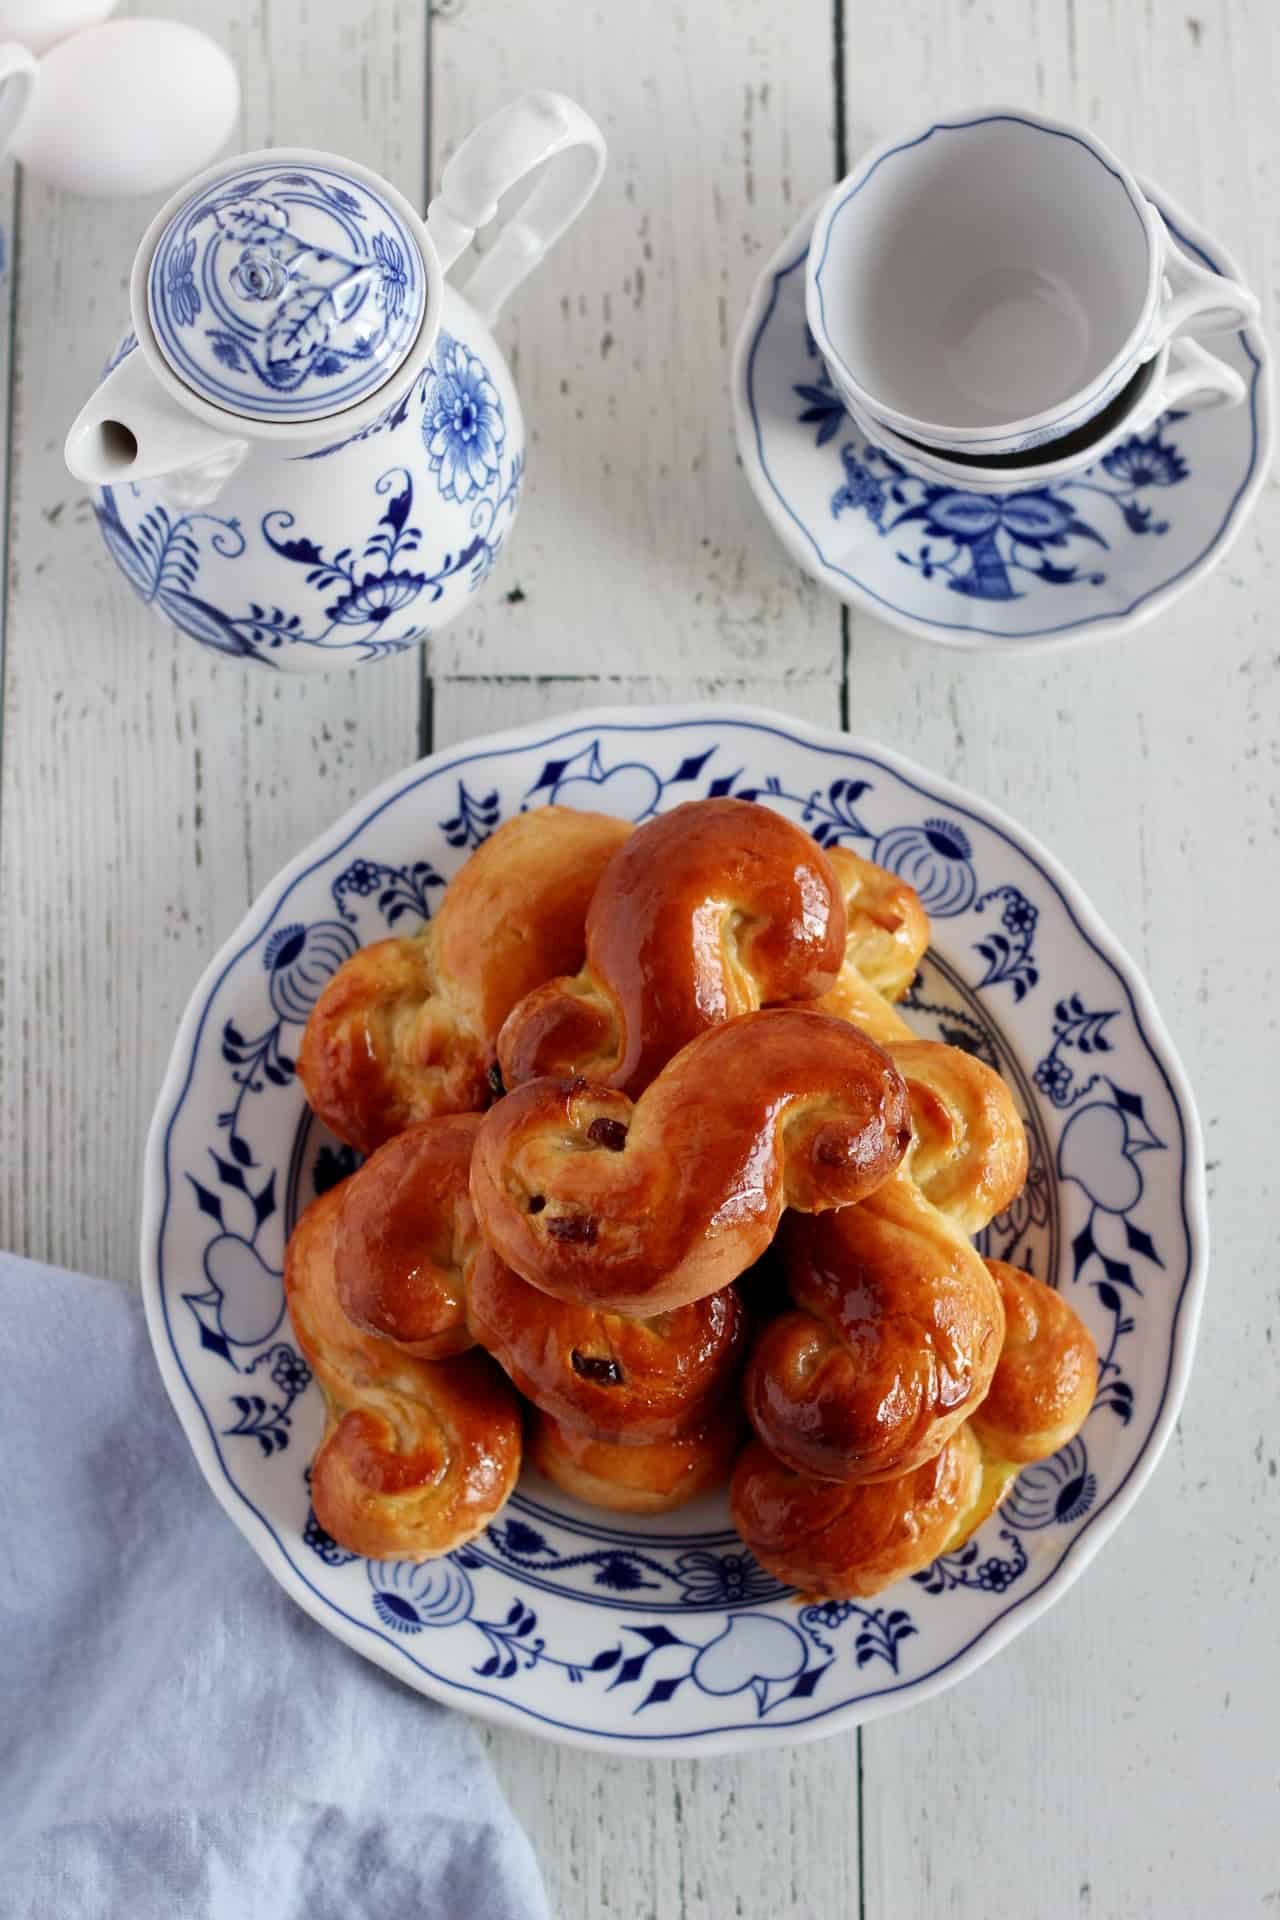 sweet pastry jidase